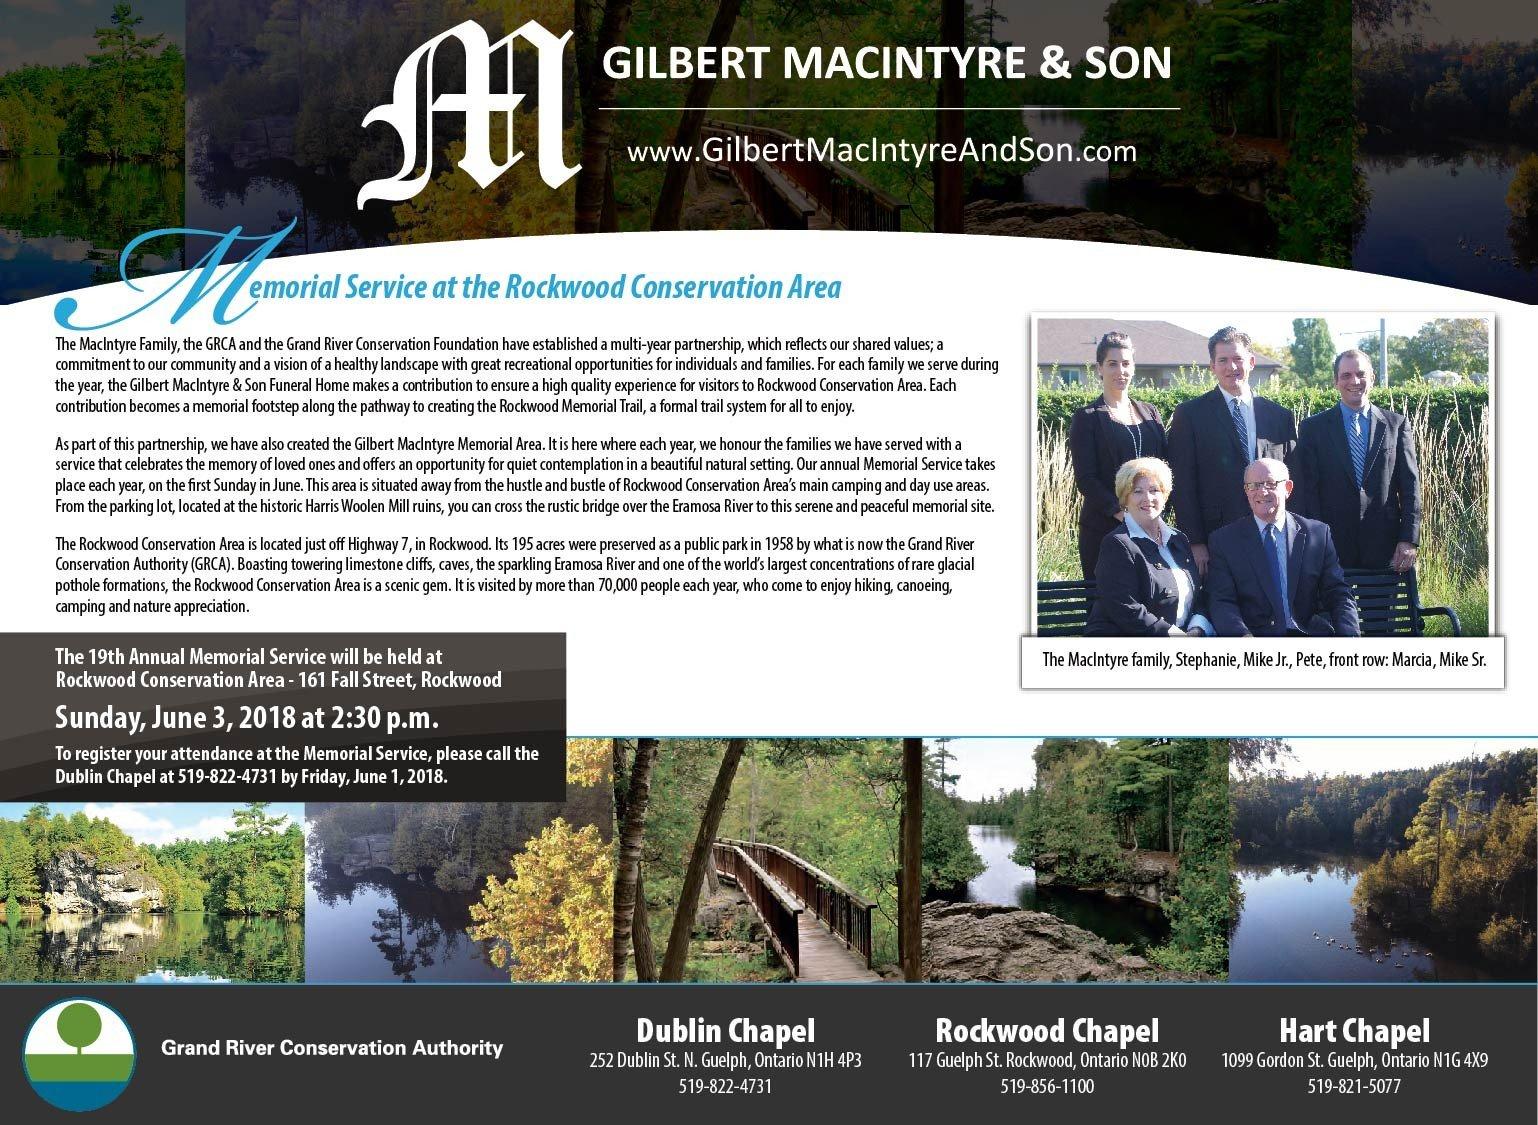 Gilbert MacIntyre & Son Funeral Home